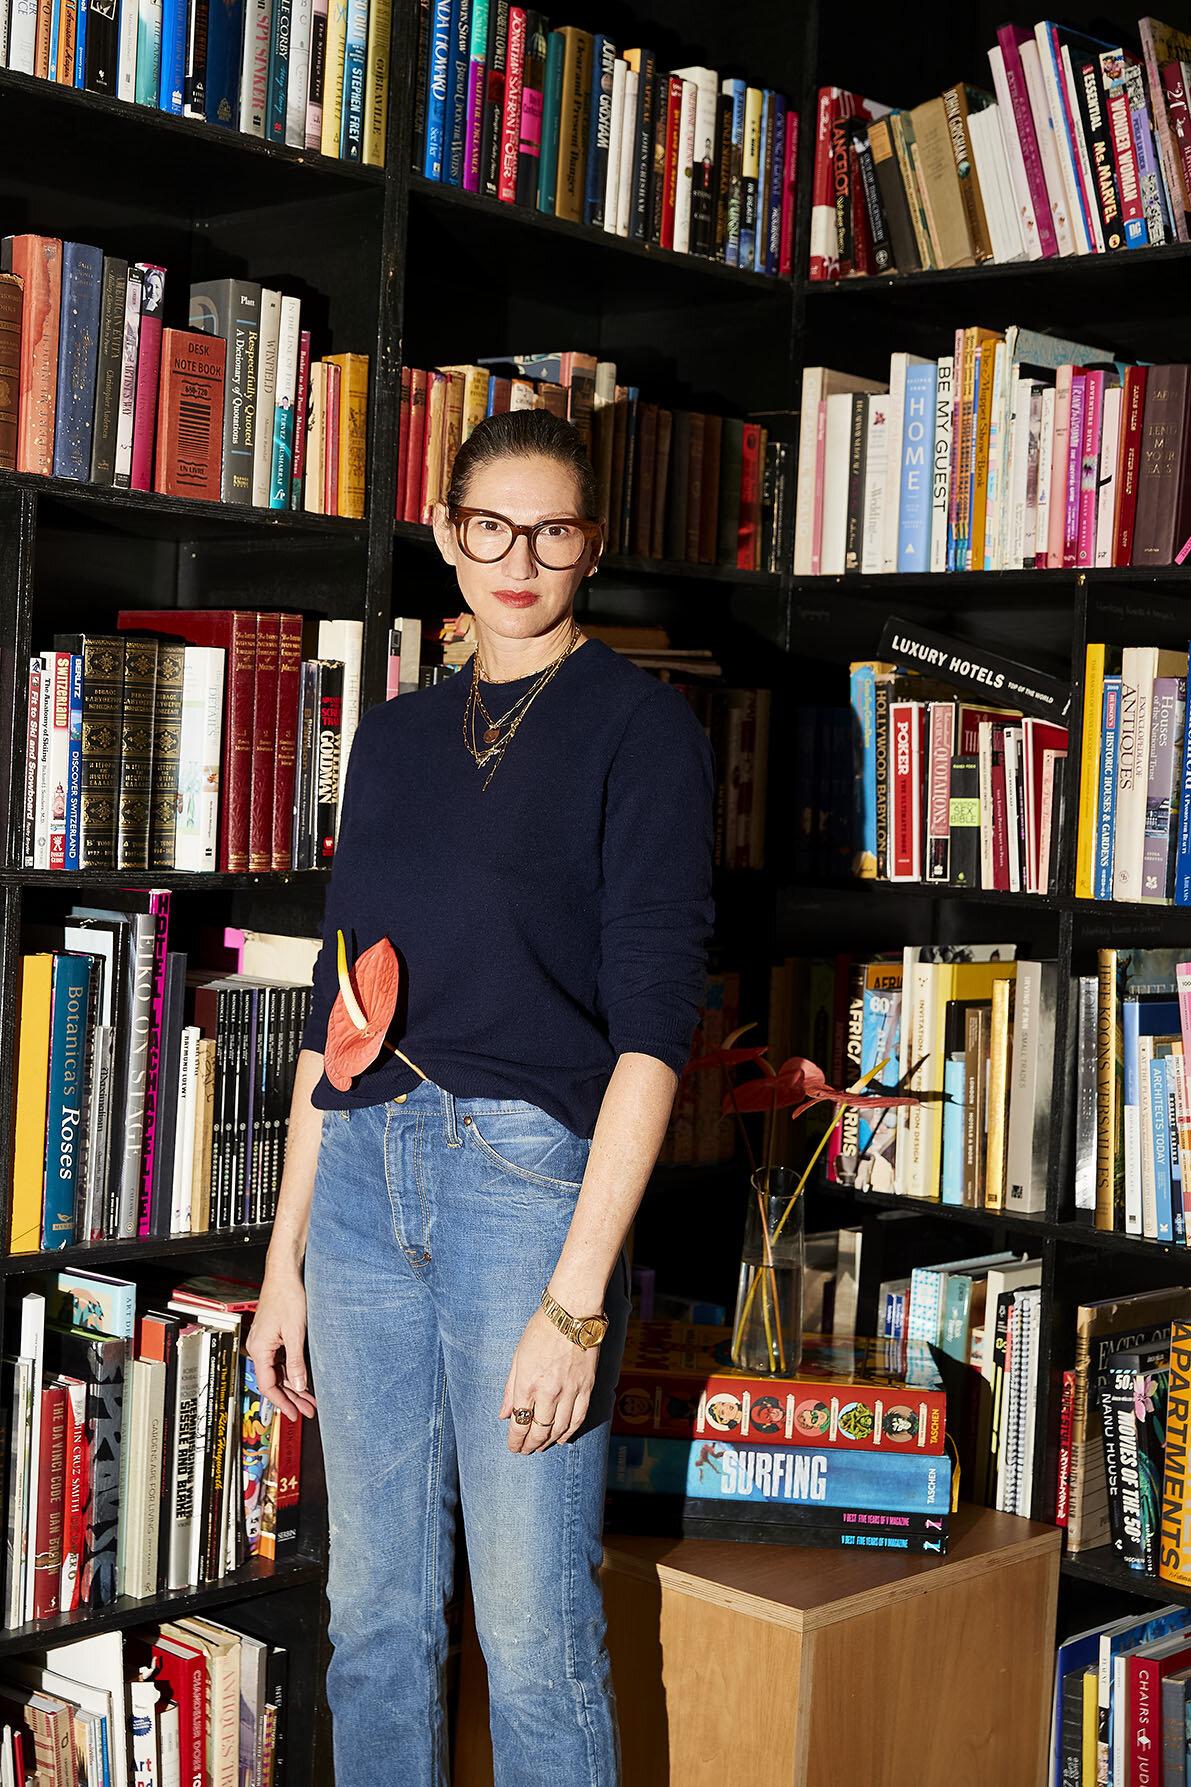 jenna-lyons-fashion-designer-new-york-chandelier-creative-guillaume-ziccarelli-02.jpg